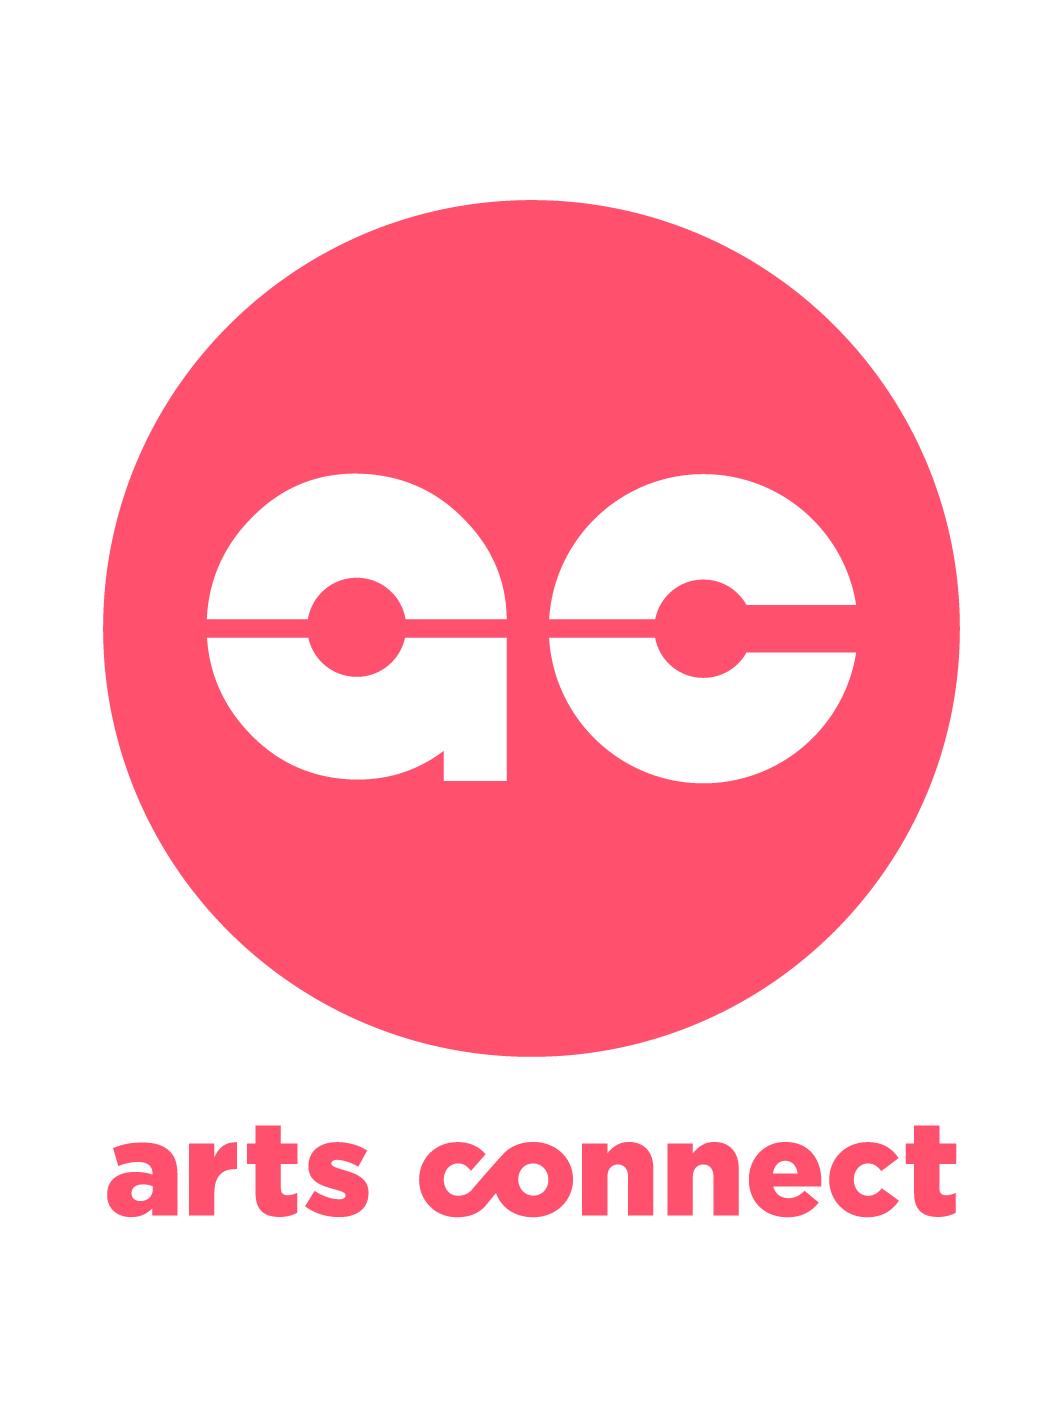 Arts Connect logo_Peach Circle_CMYK